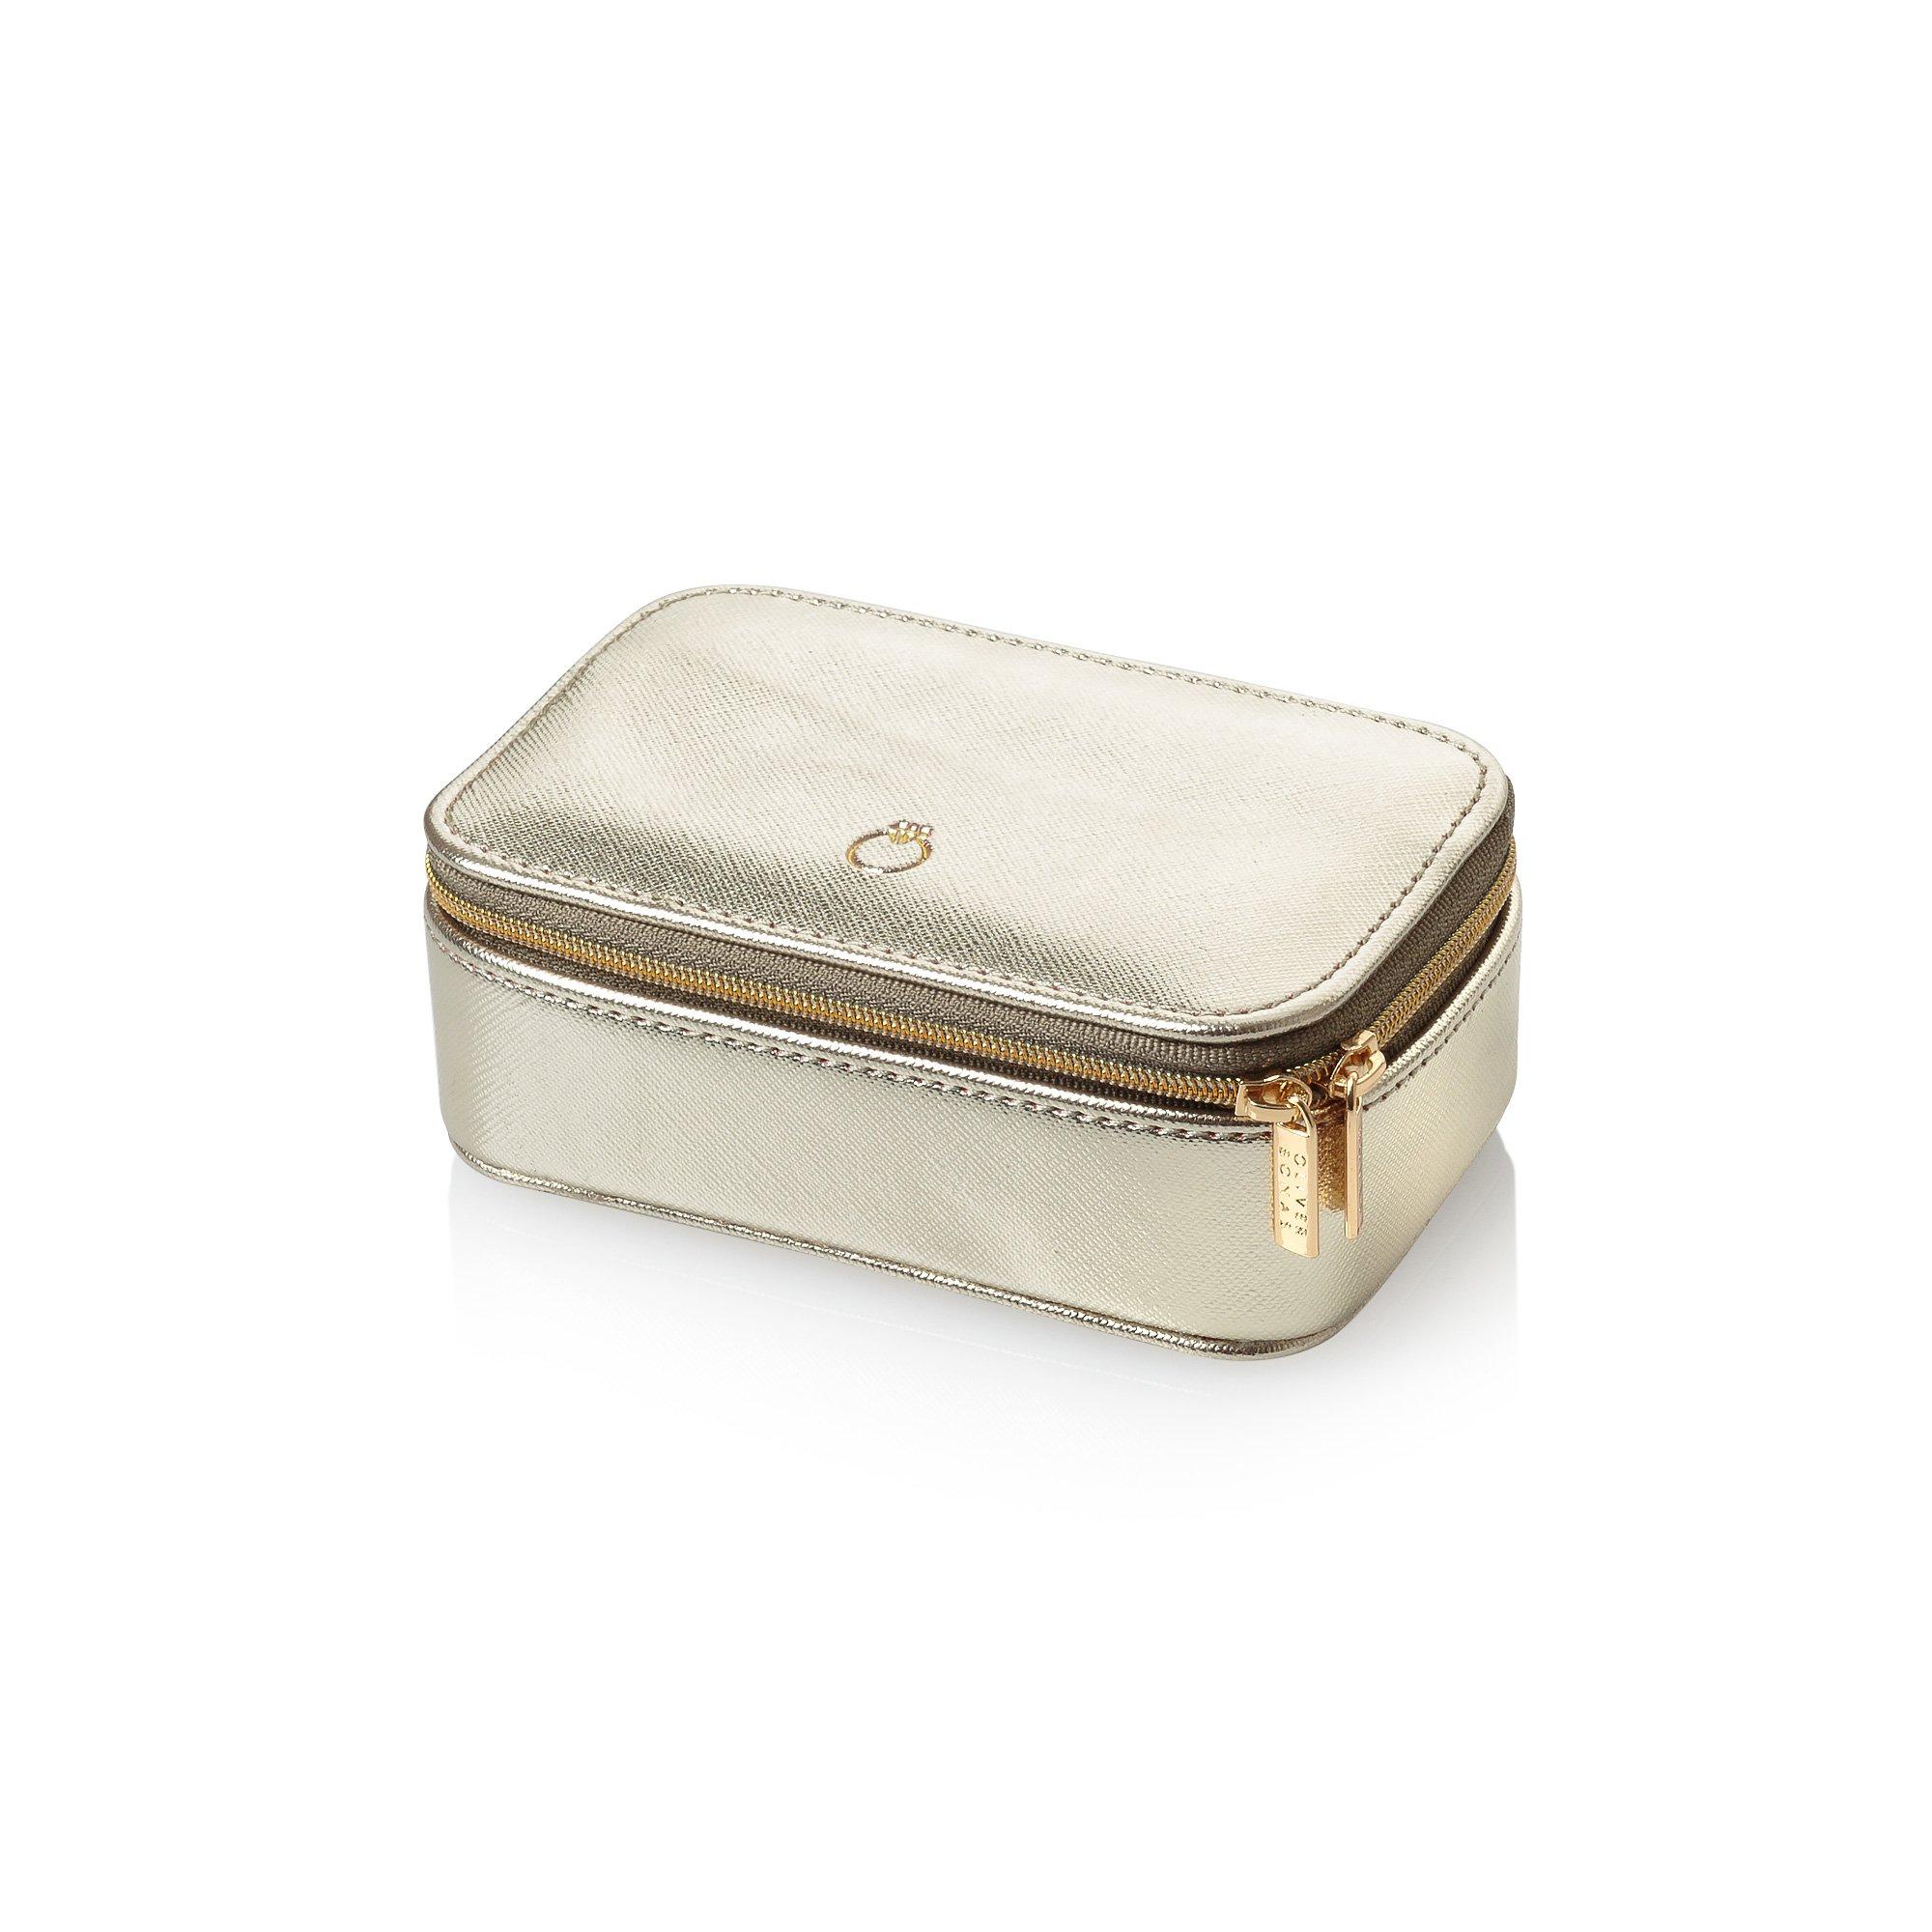 Small Travel Trailer Interiors: Gold Amelia Small Travel Jewellery Box